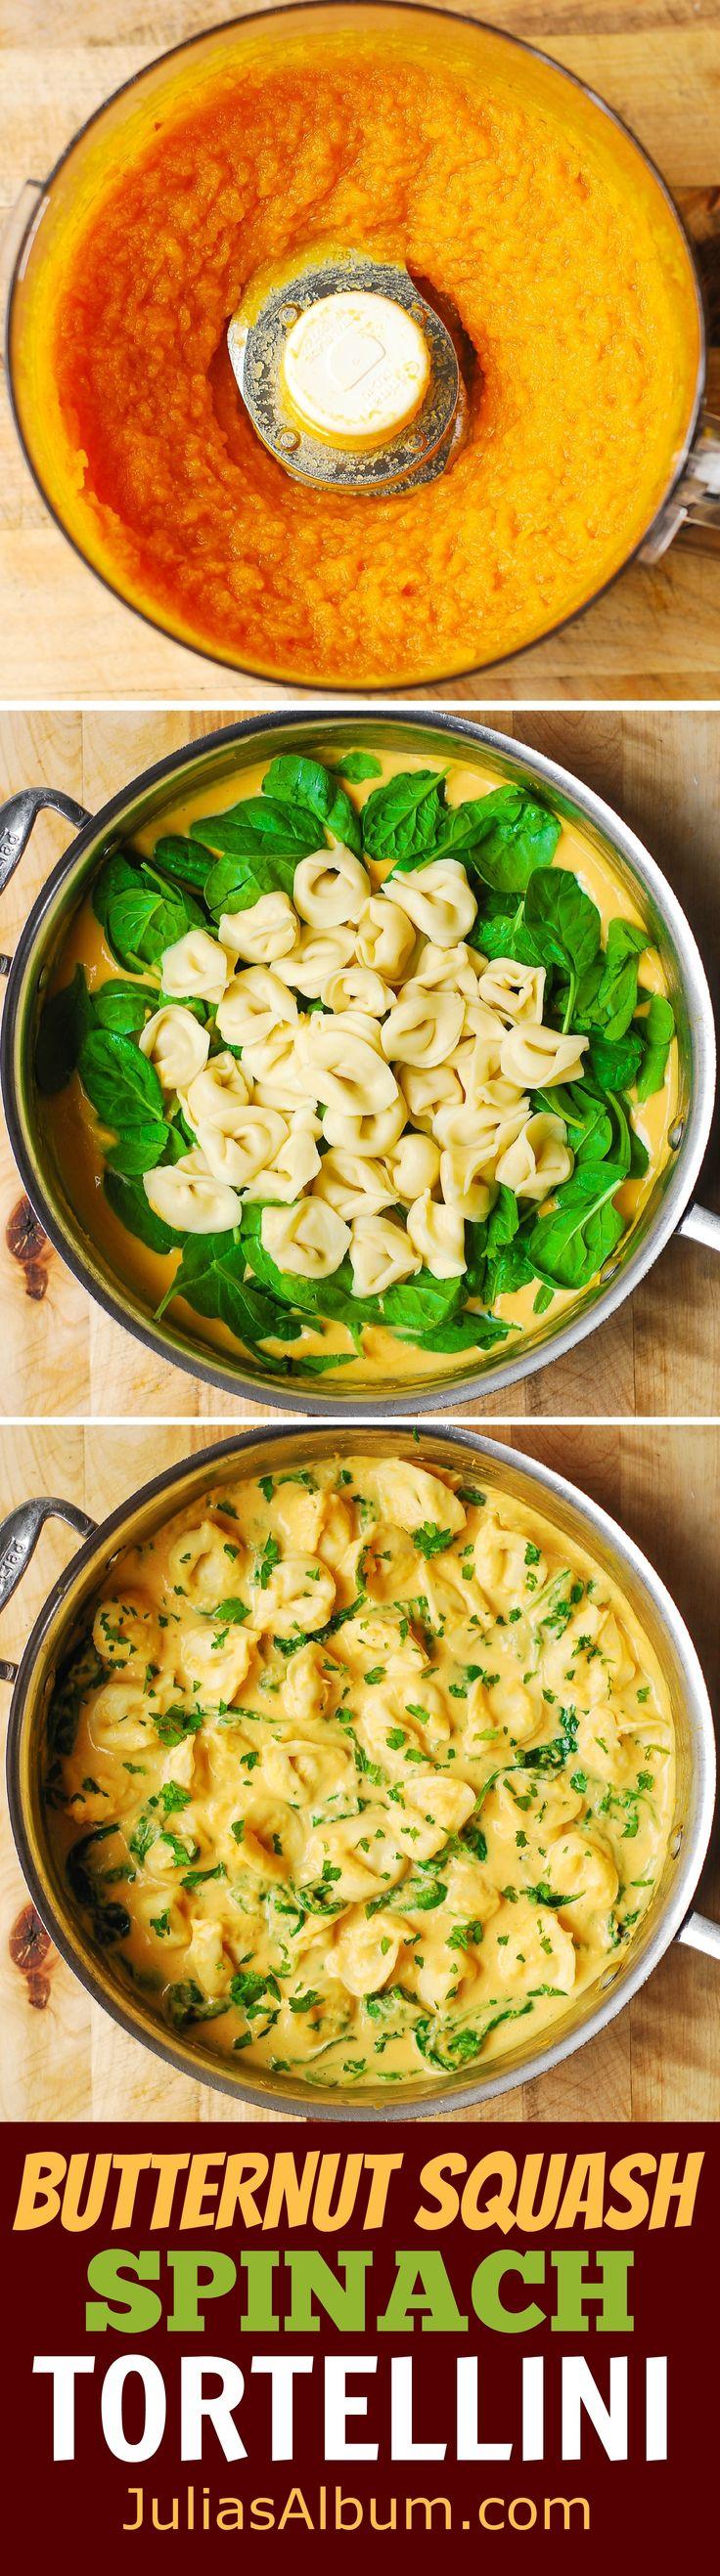 butternut squash and spinach tortellini espinacas sopa de